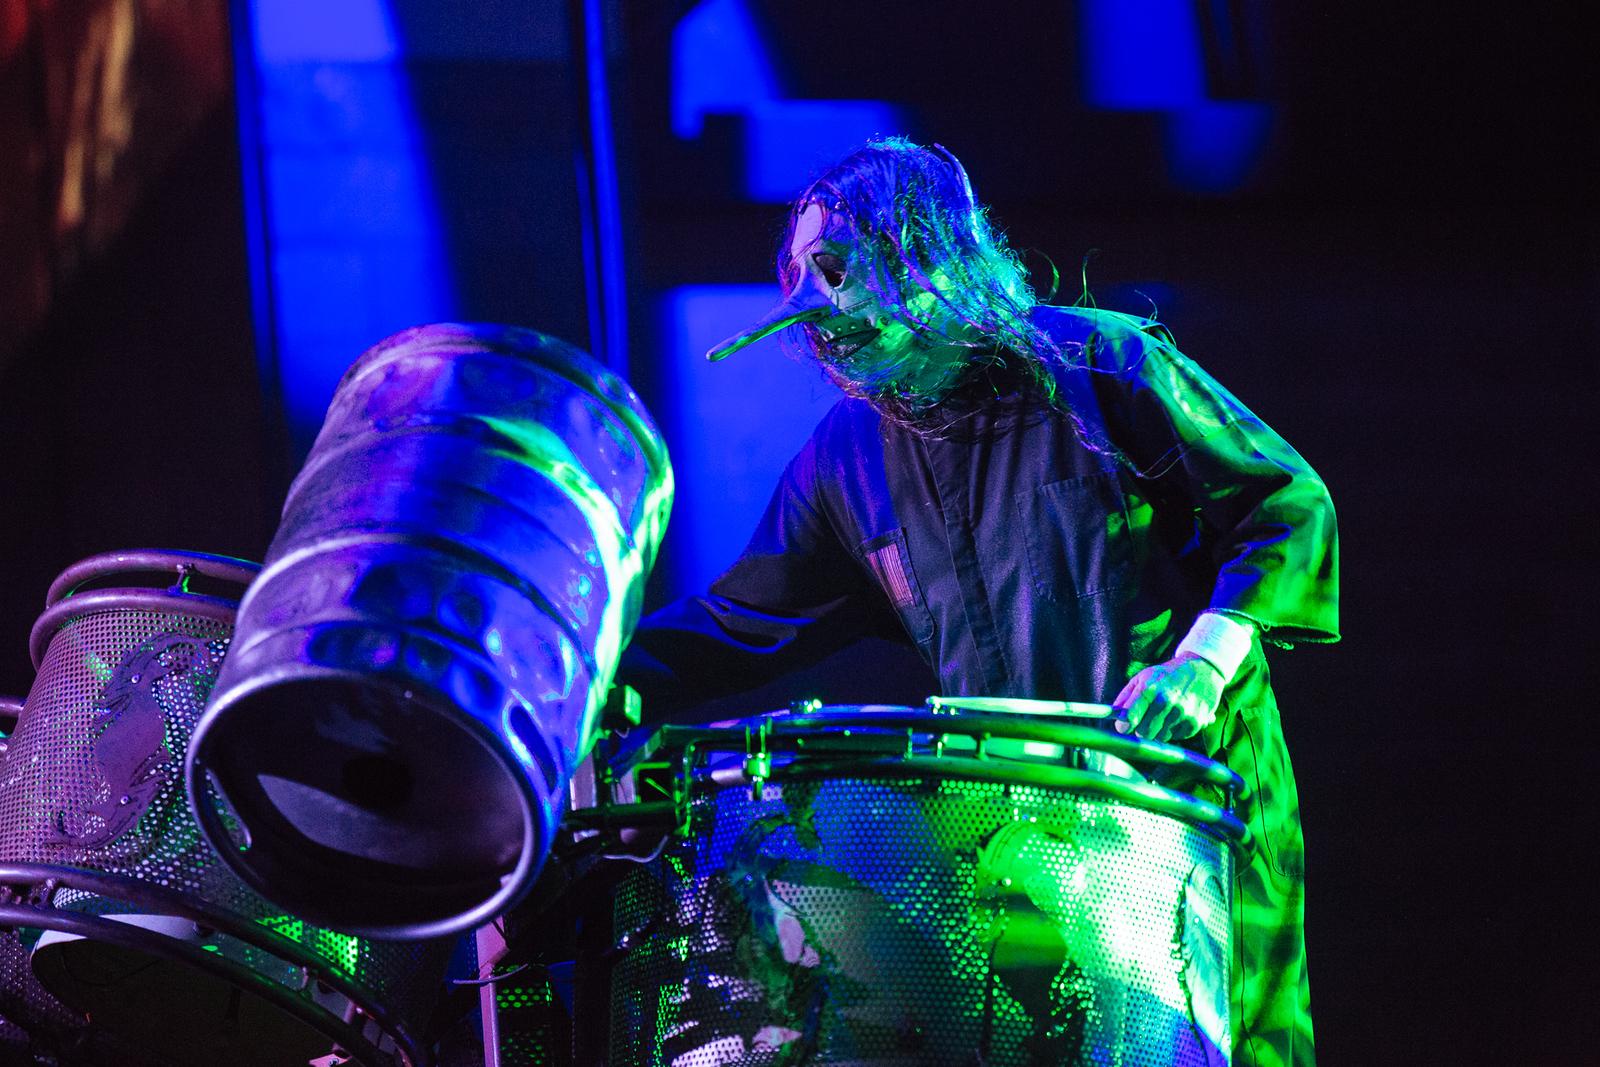 Chris Fehn of Slipknot by Adam Elmakias at Knotfest 2015